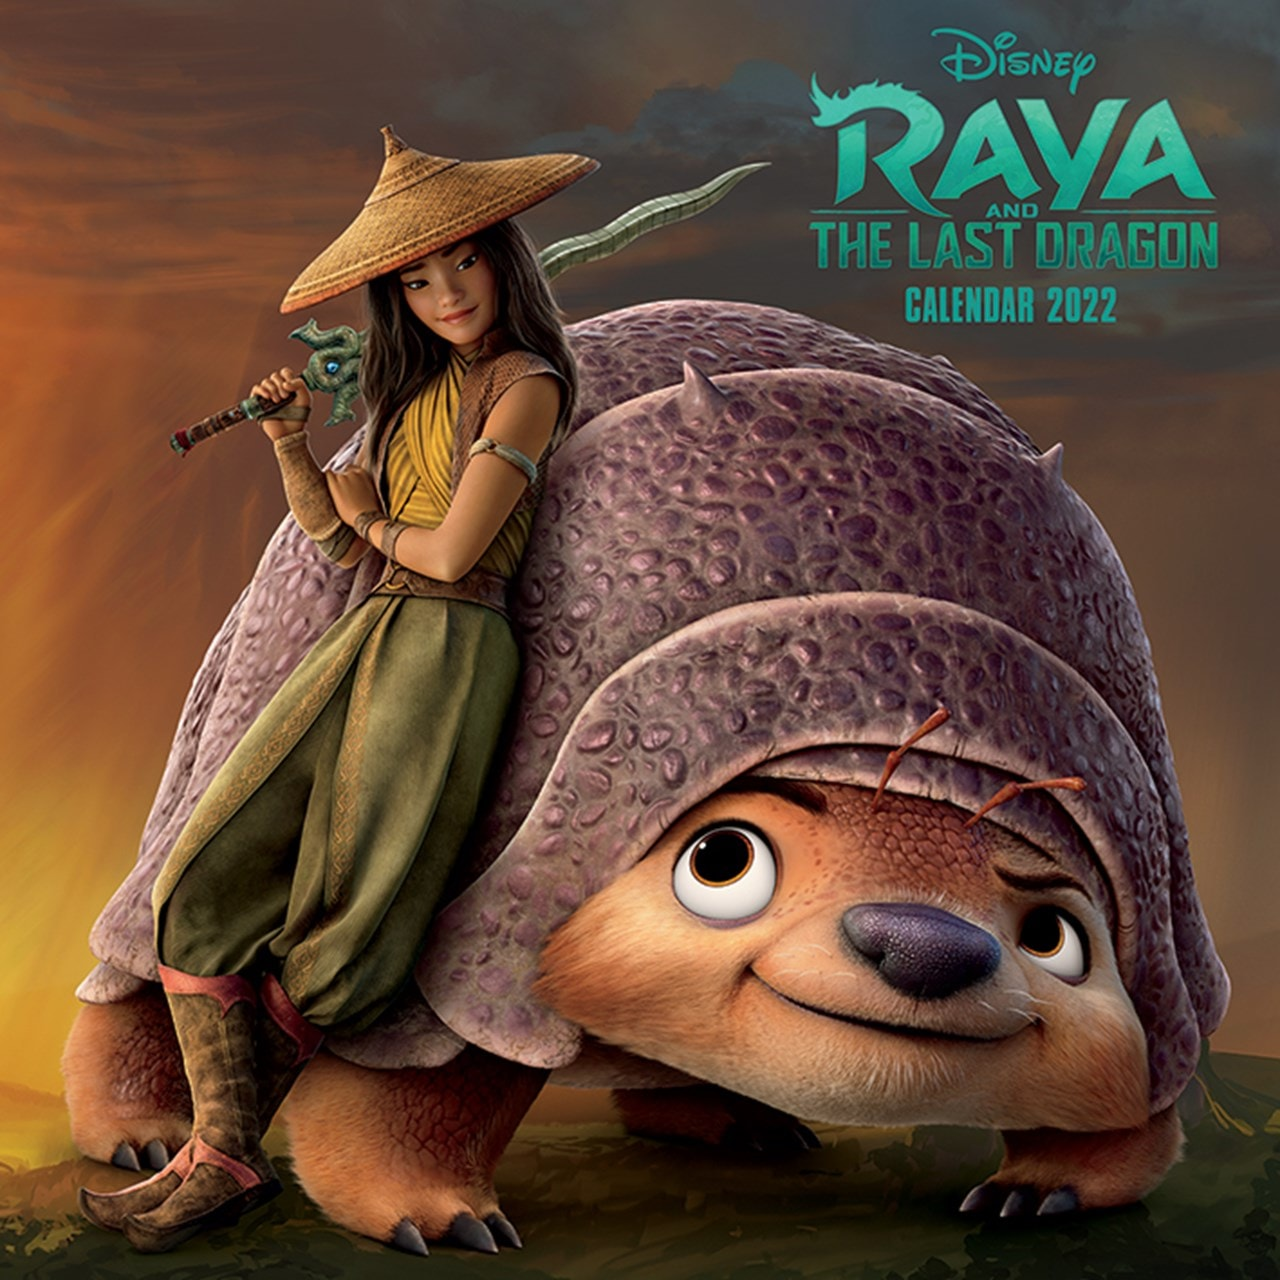 Raya and the Last Dragon: Square 2022 Calendar - 1